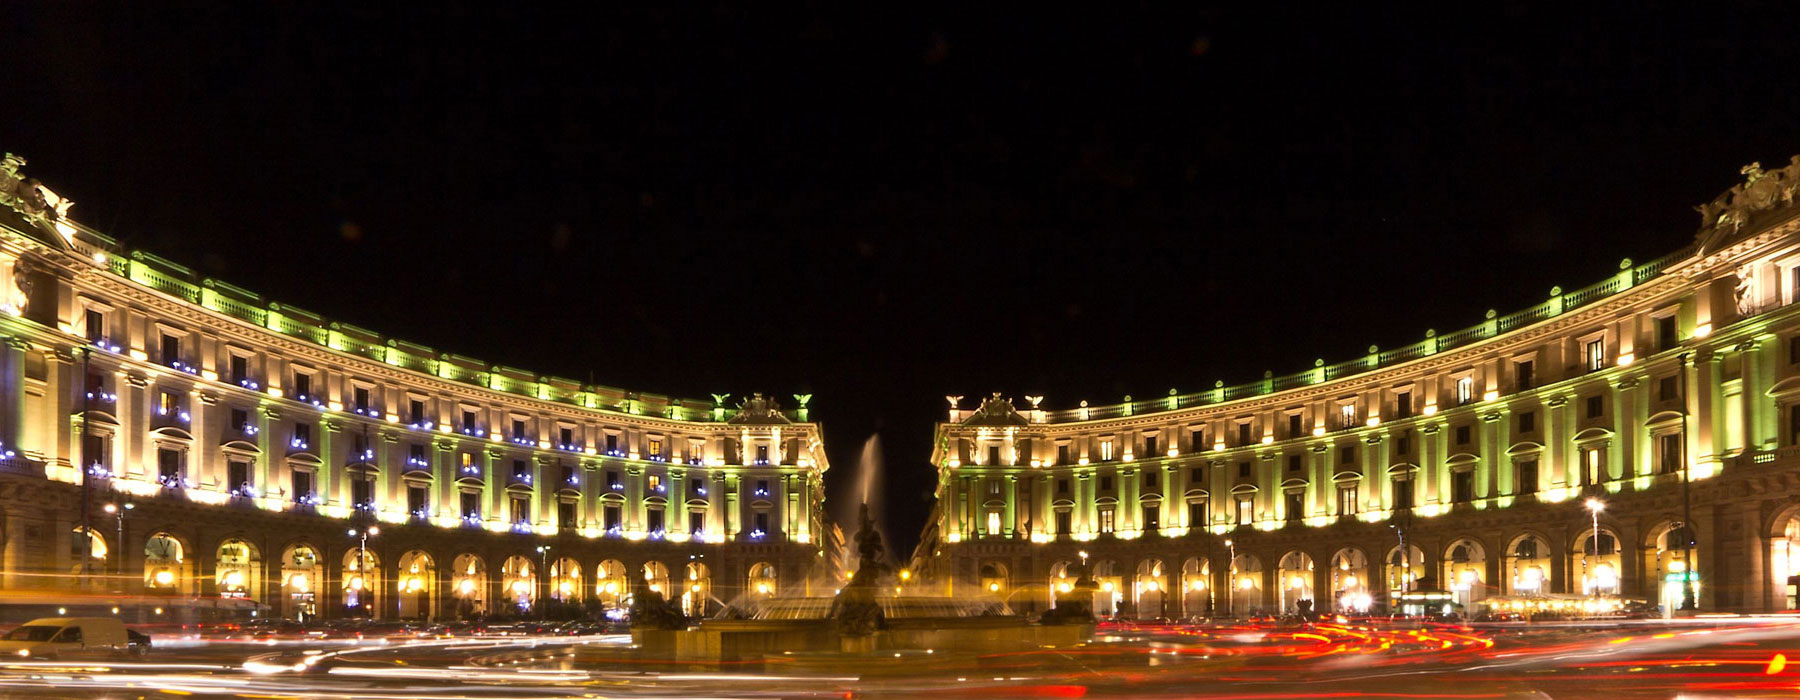 Roma_12.jpg